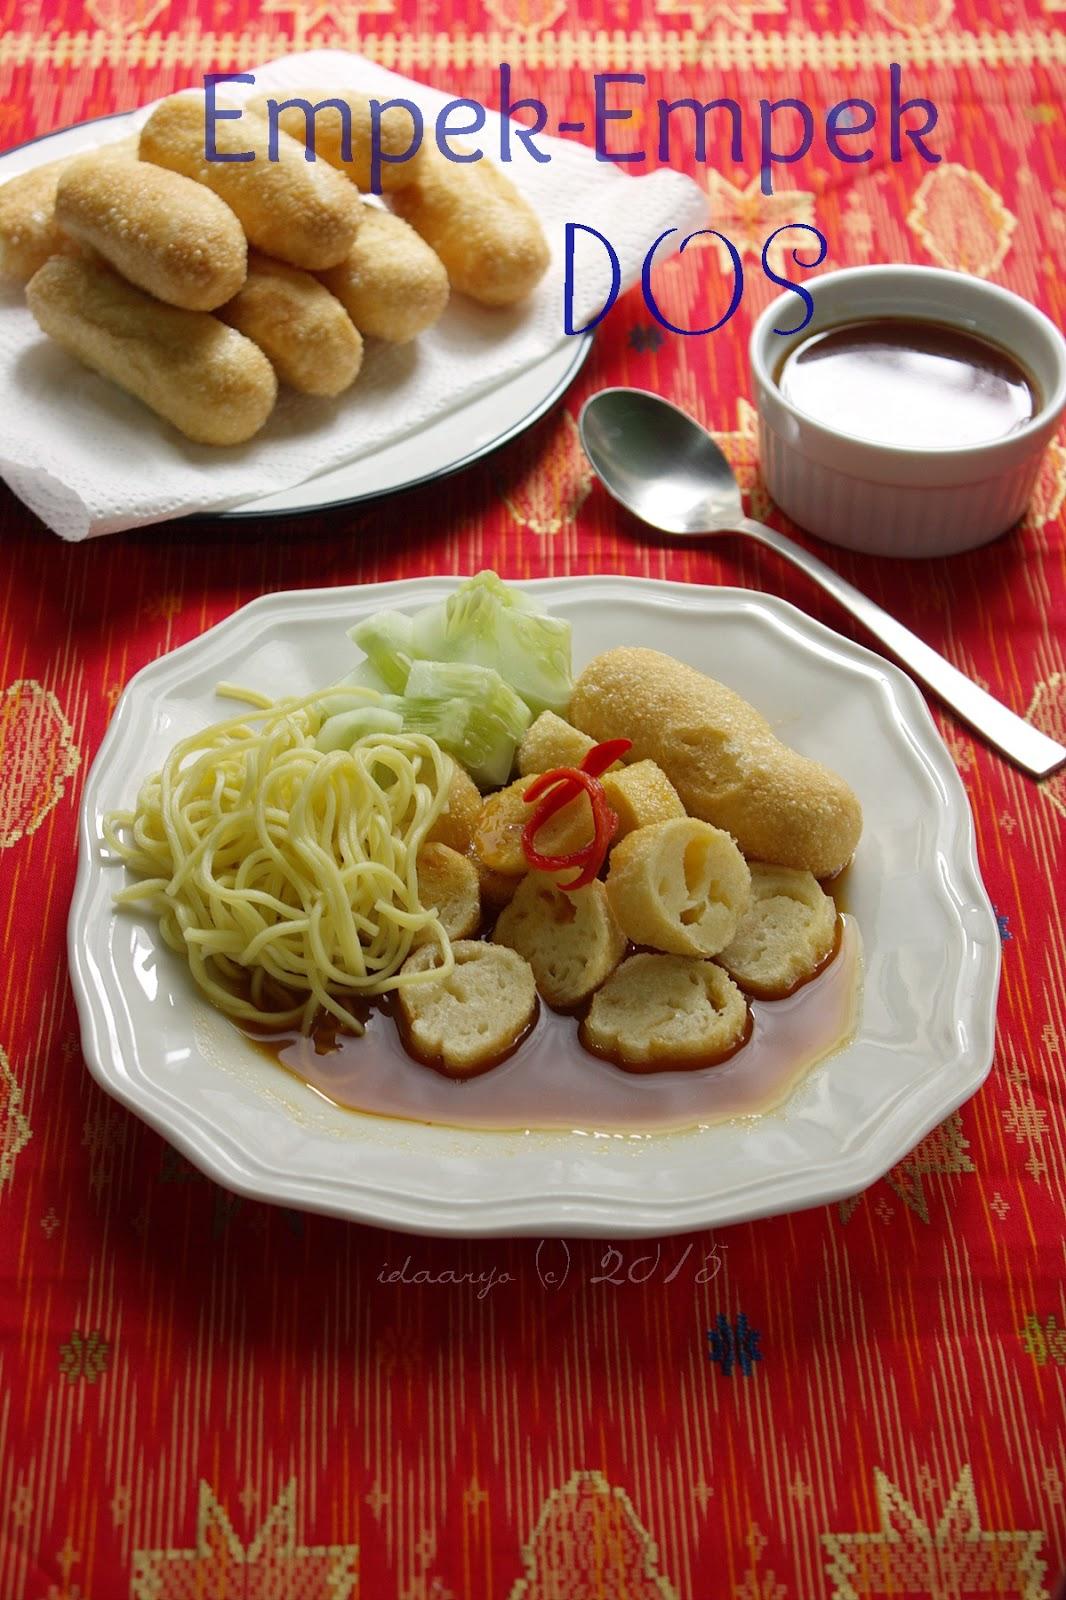 Resep Mpek Mpek Dos : resep, Ida's, Homemade......:, Empek-Empek, (Empek-empek, Tanpa, Ikan), Widya, Arina